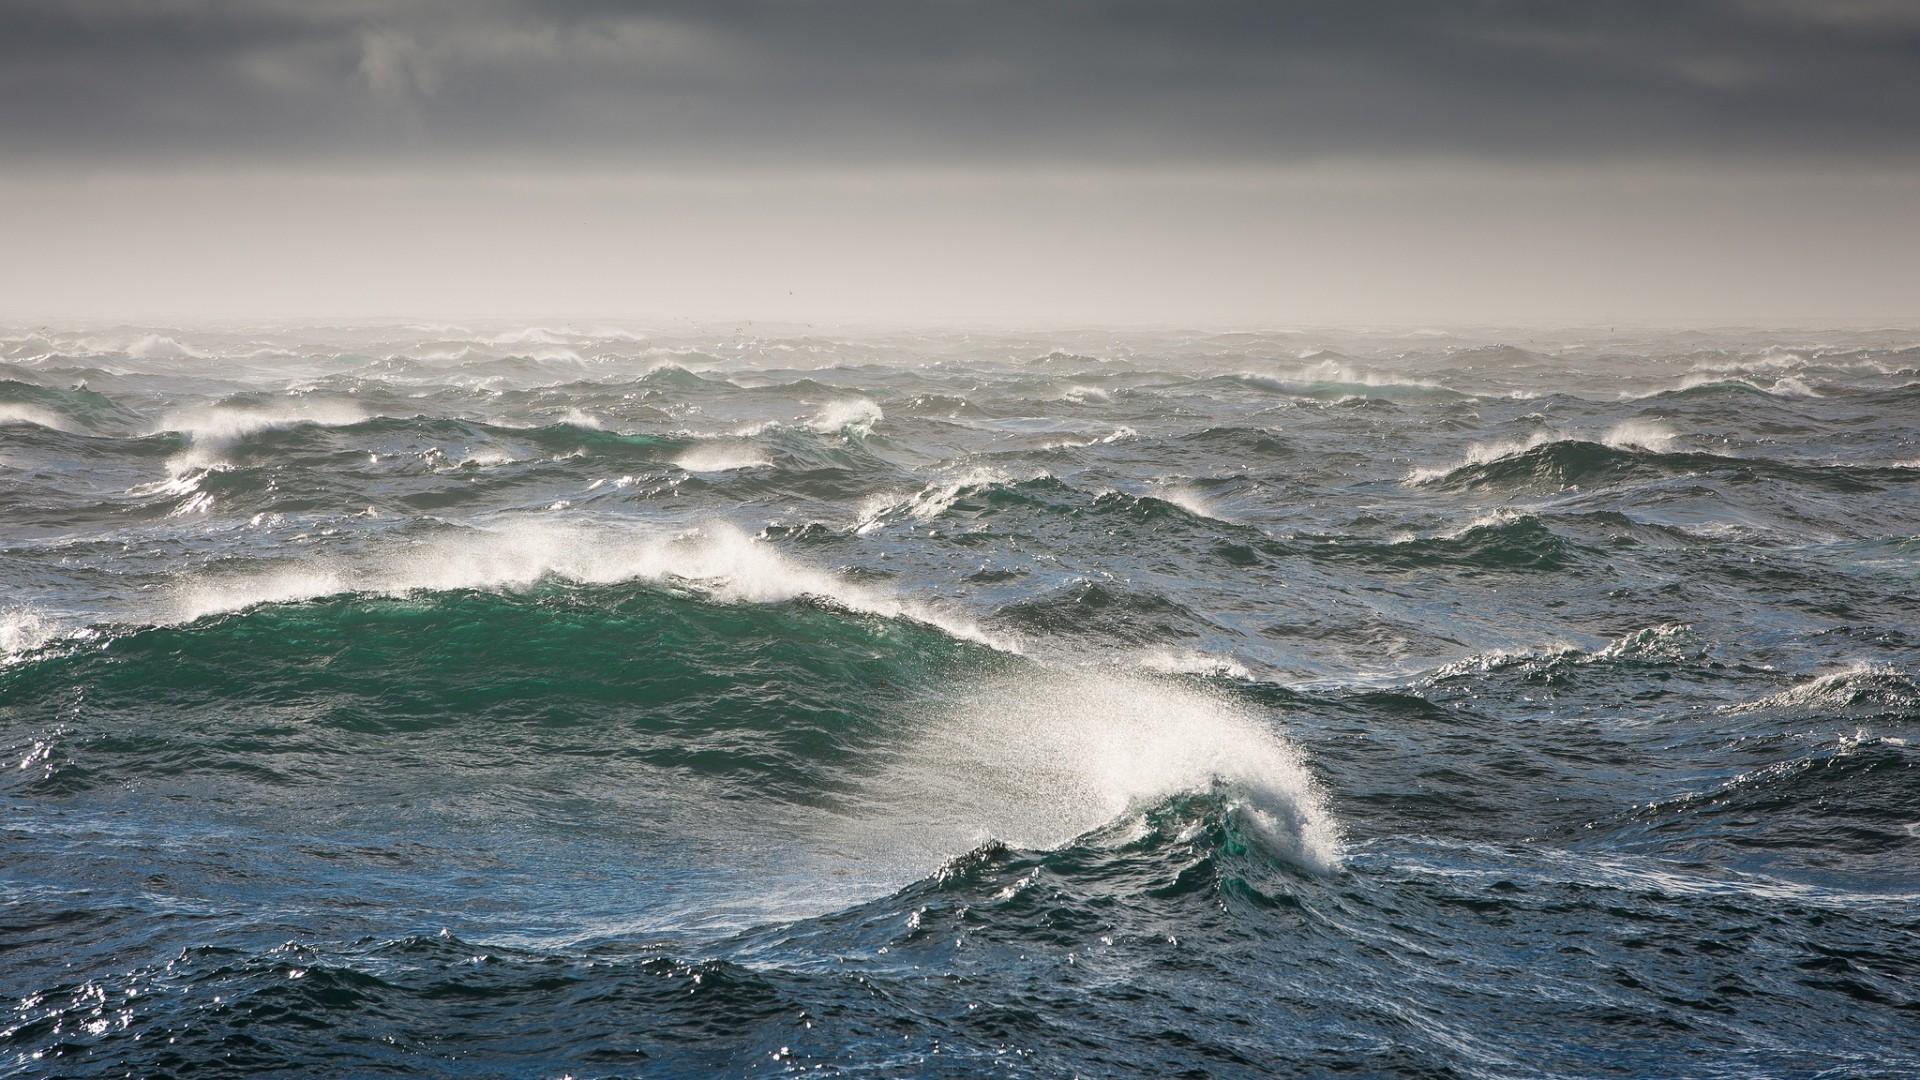 Lightning Storm at Sea   HD Exciting Storm At Sea Wallpaper .